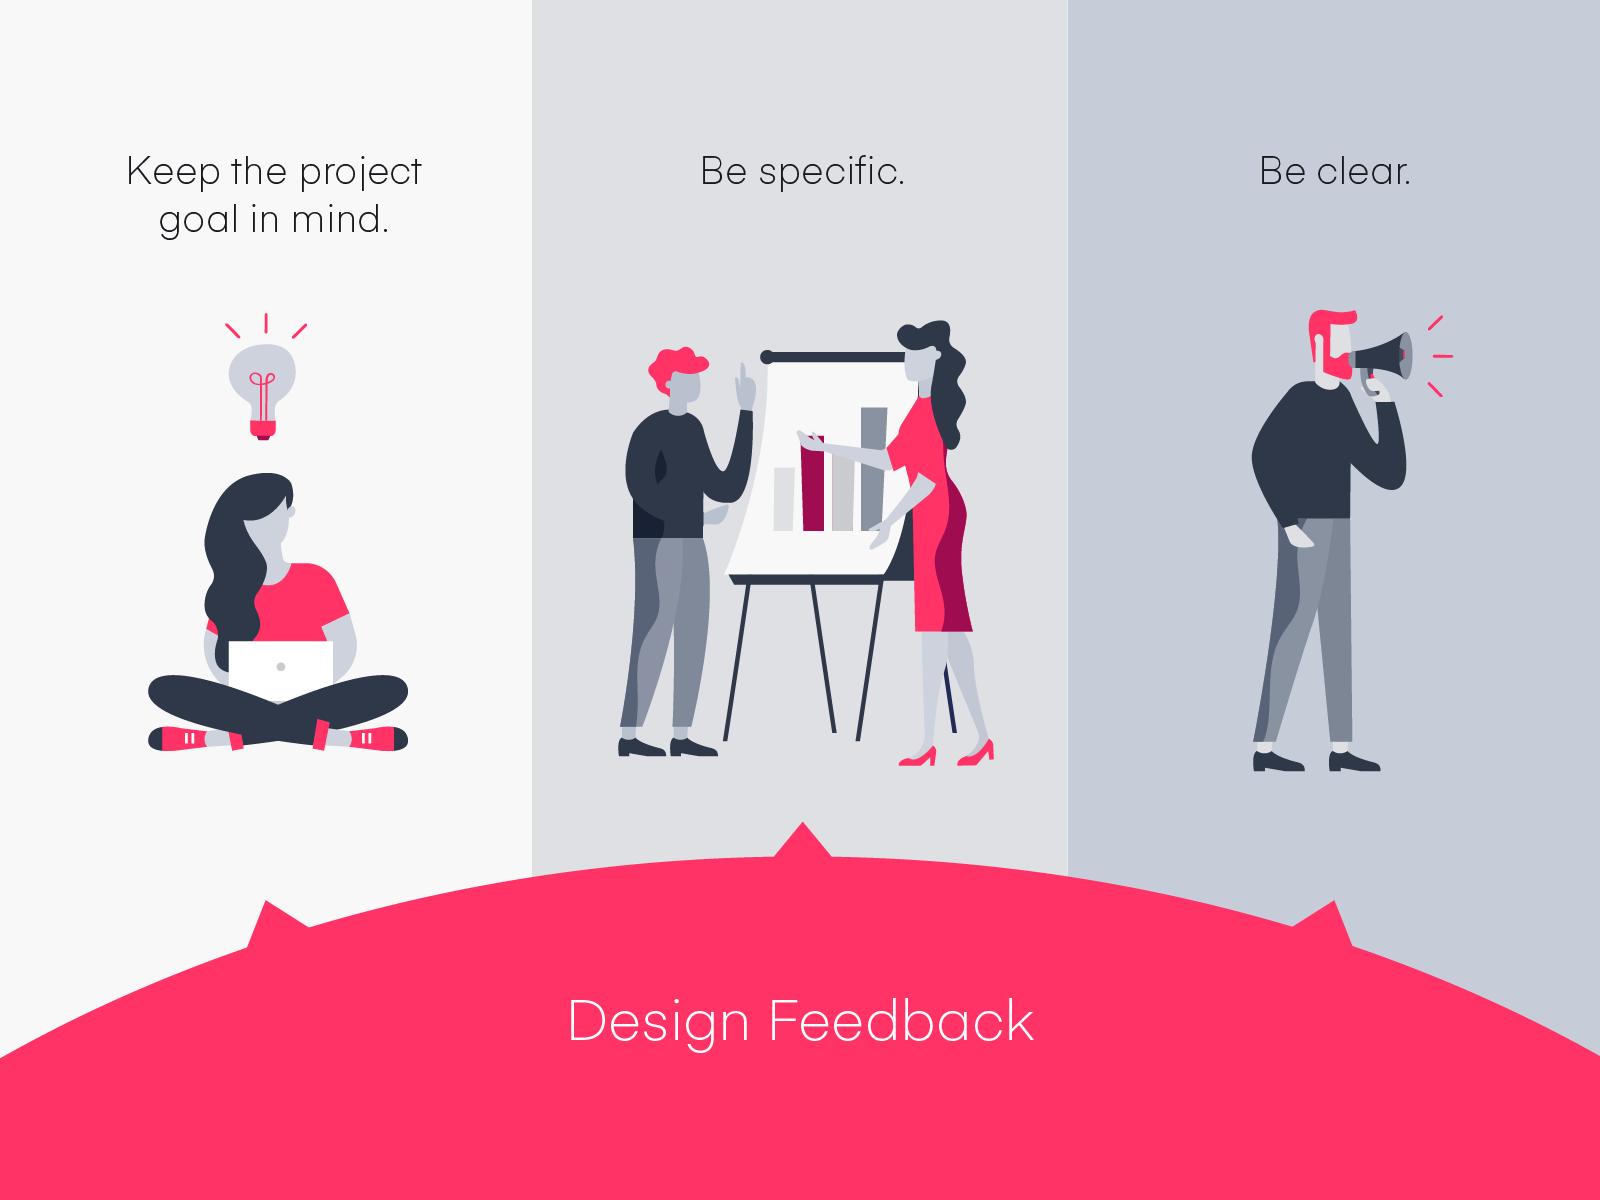 Design Feedback & Constructive Criticism